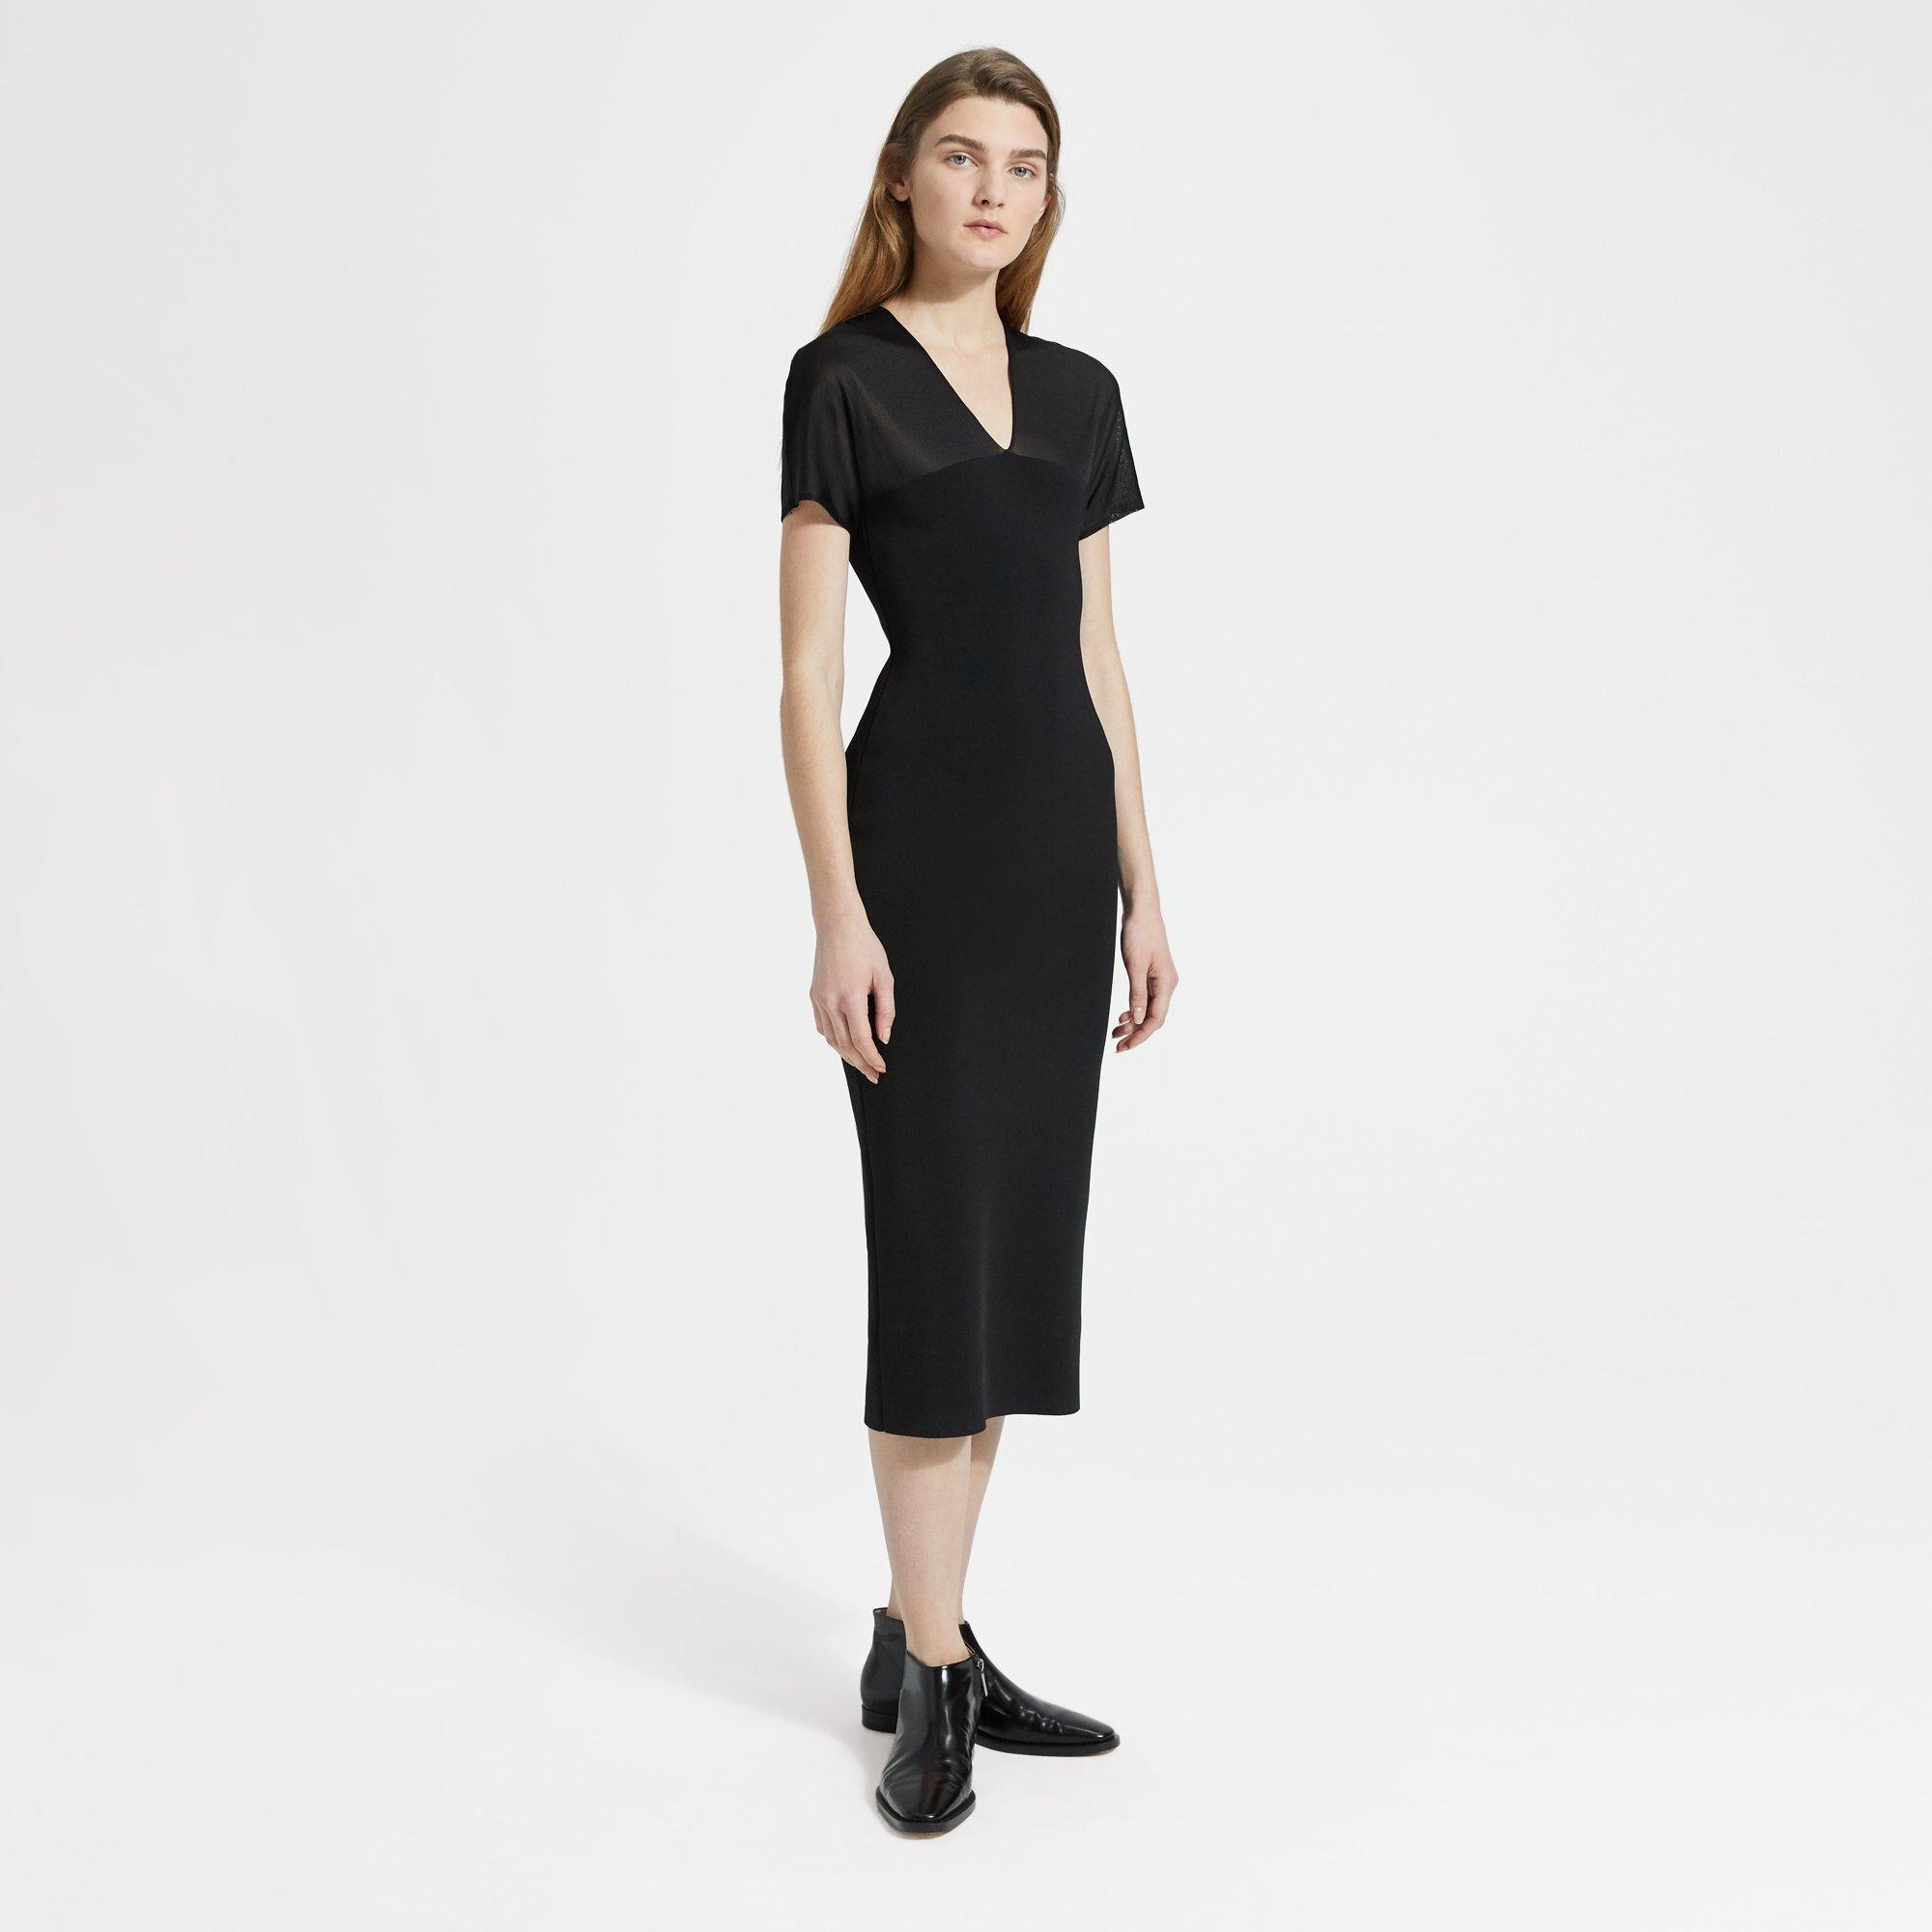 Theory Kimono Dress  - BLACK - female - Size: P